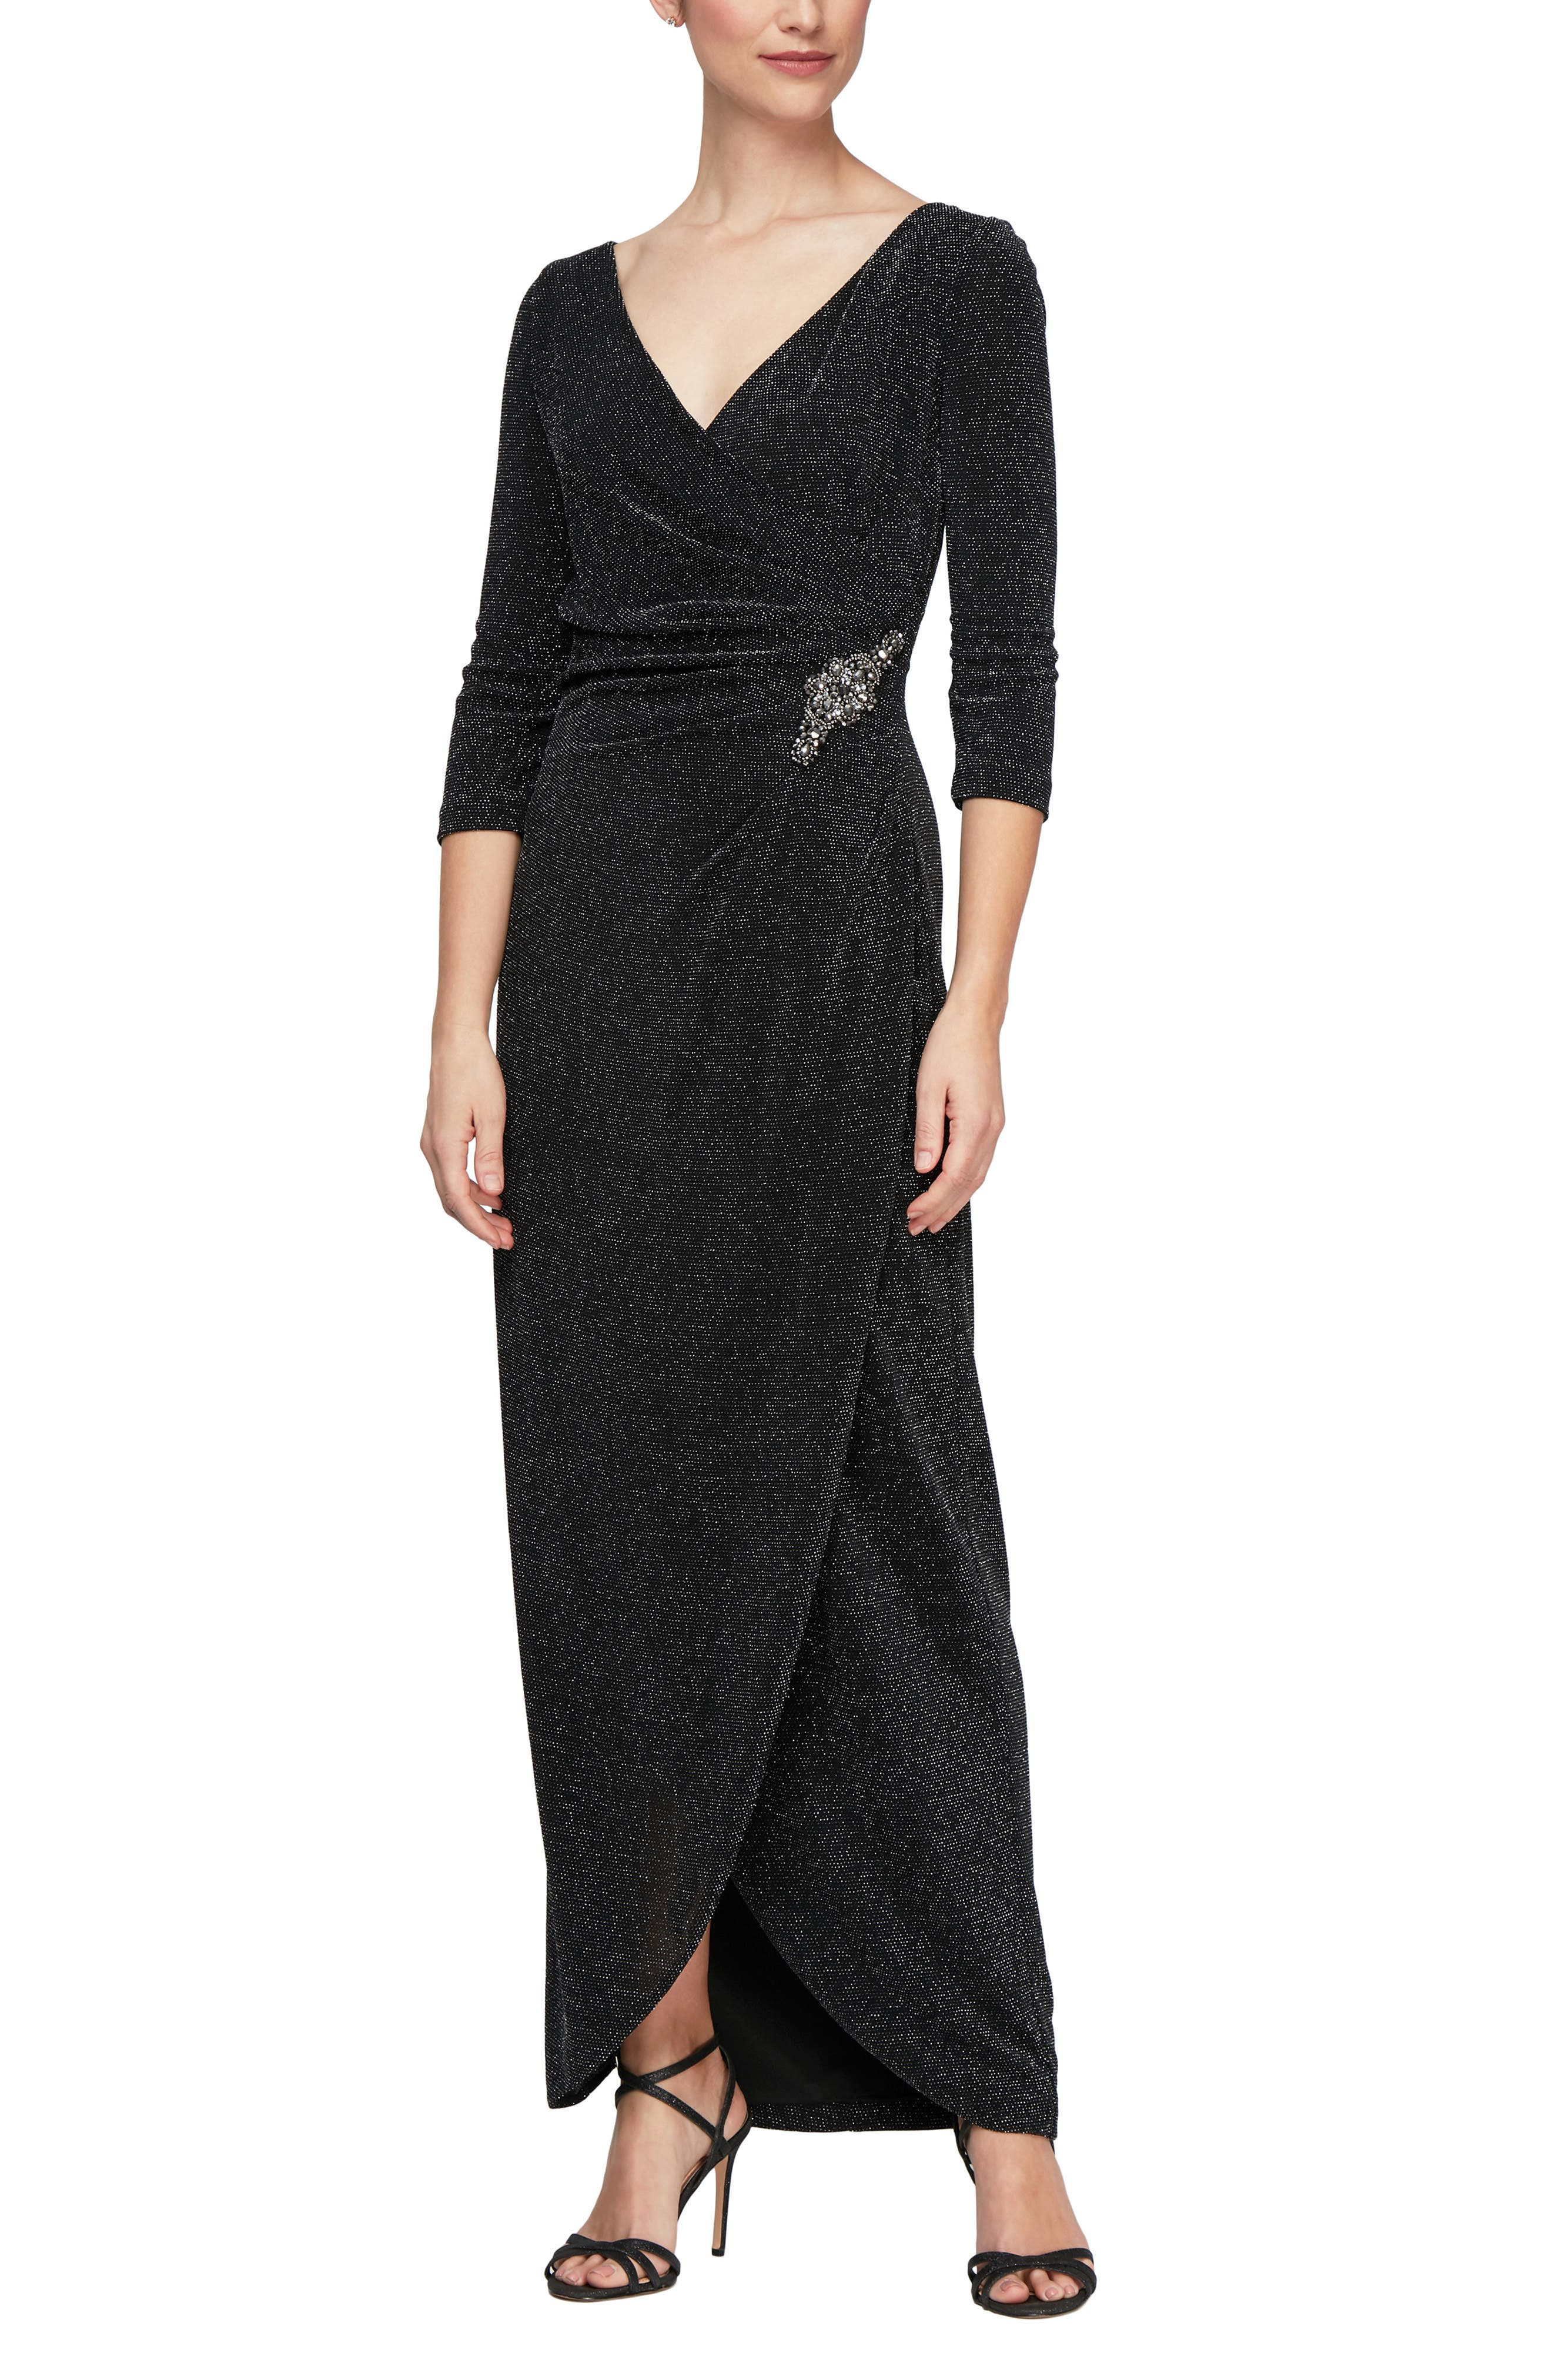 Surplice Metallic Knit Dress